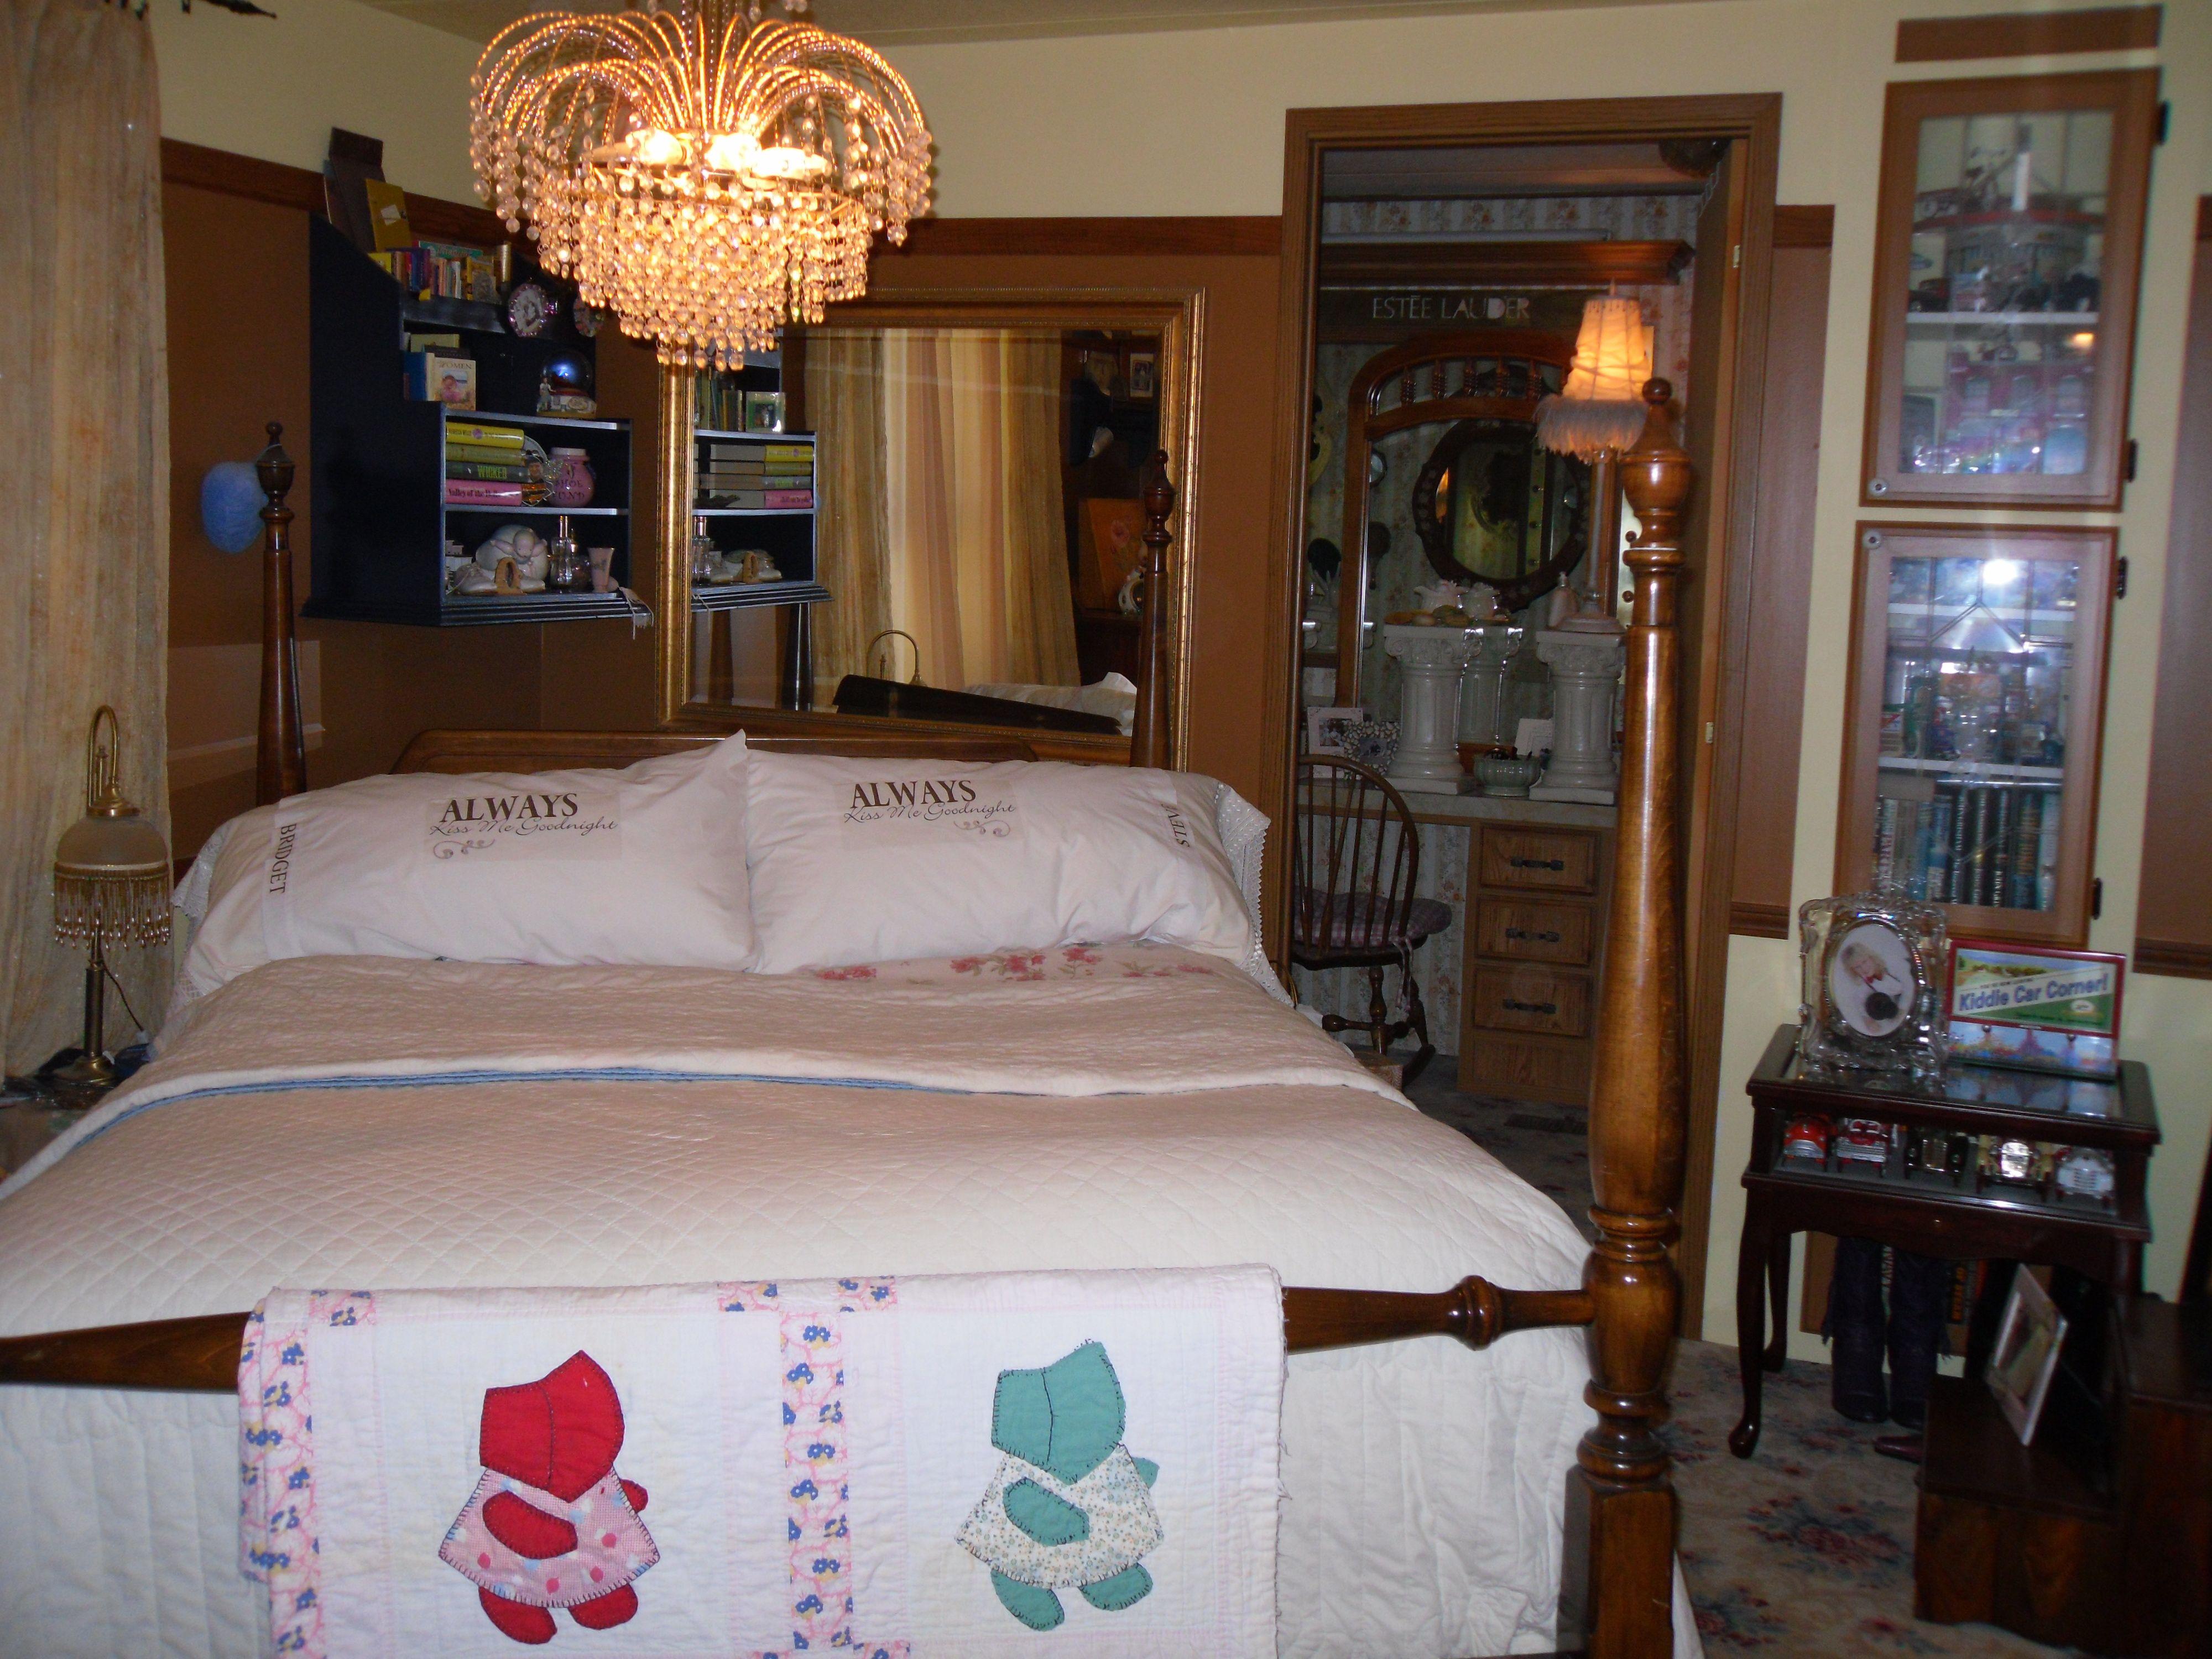 Decorating Bedrooms Ideas My Bedroom Decorating Ideas Pinterest